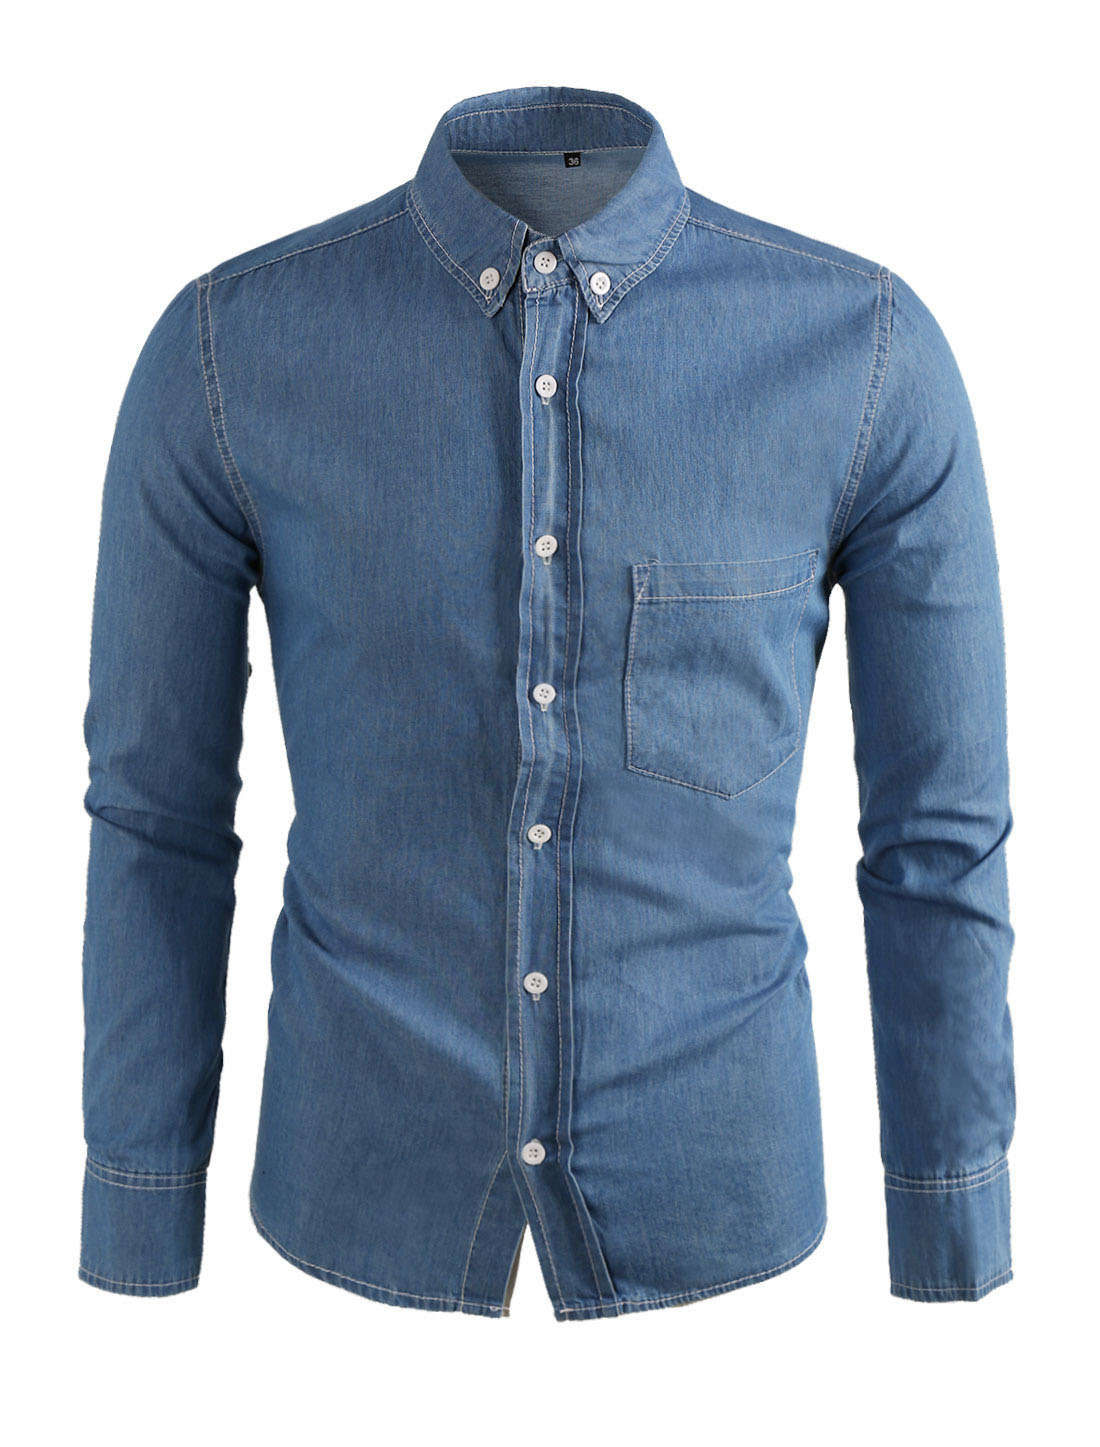 Men Button-Collar Point Collar Slim Fit Chambray Denim Shirt Blue L